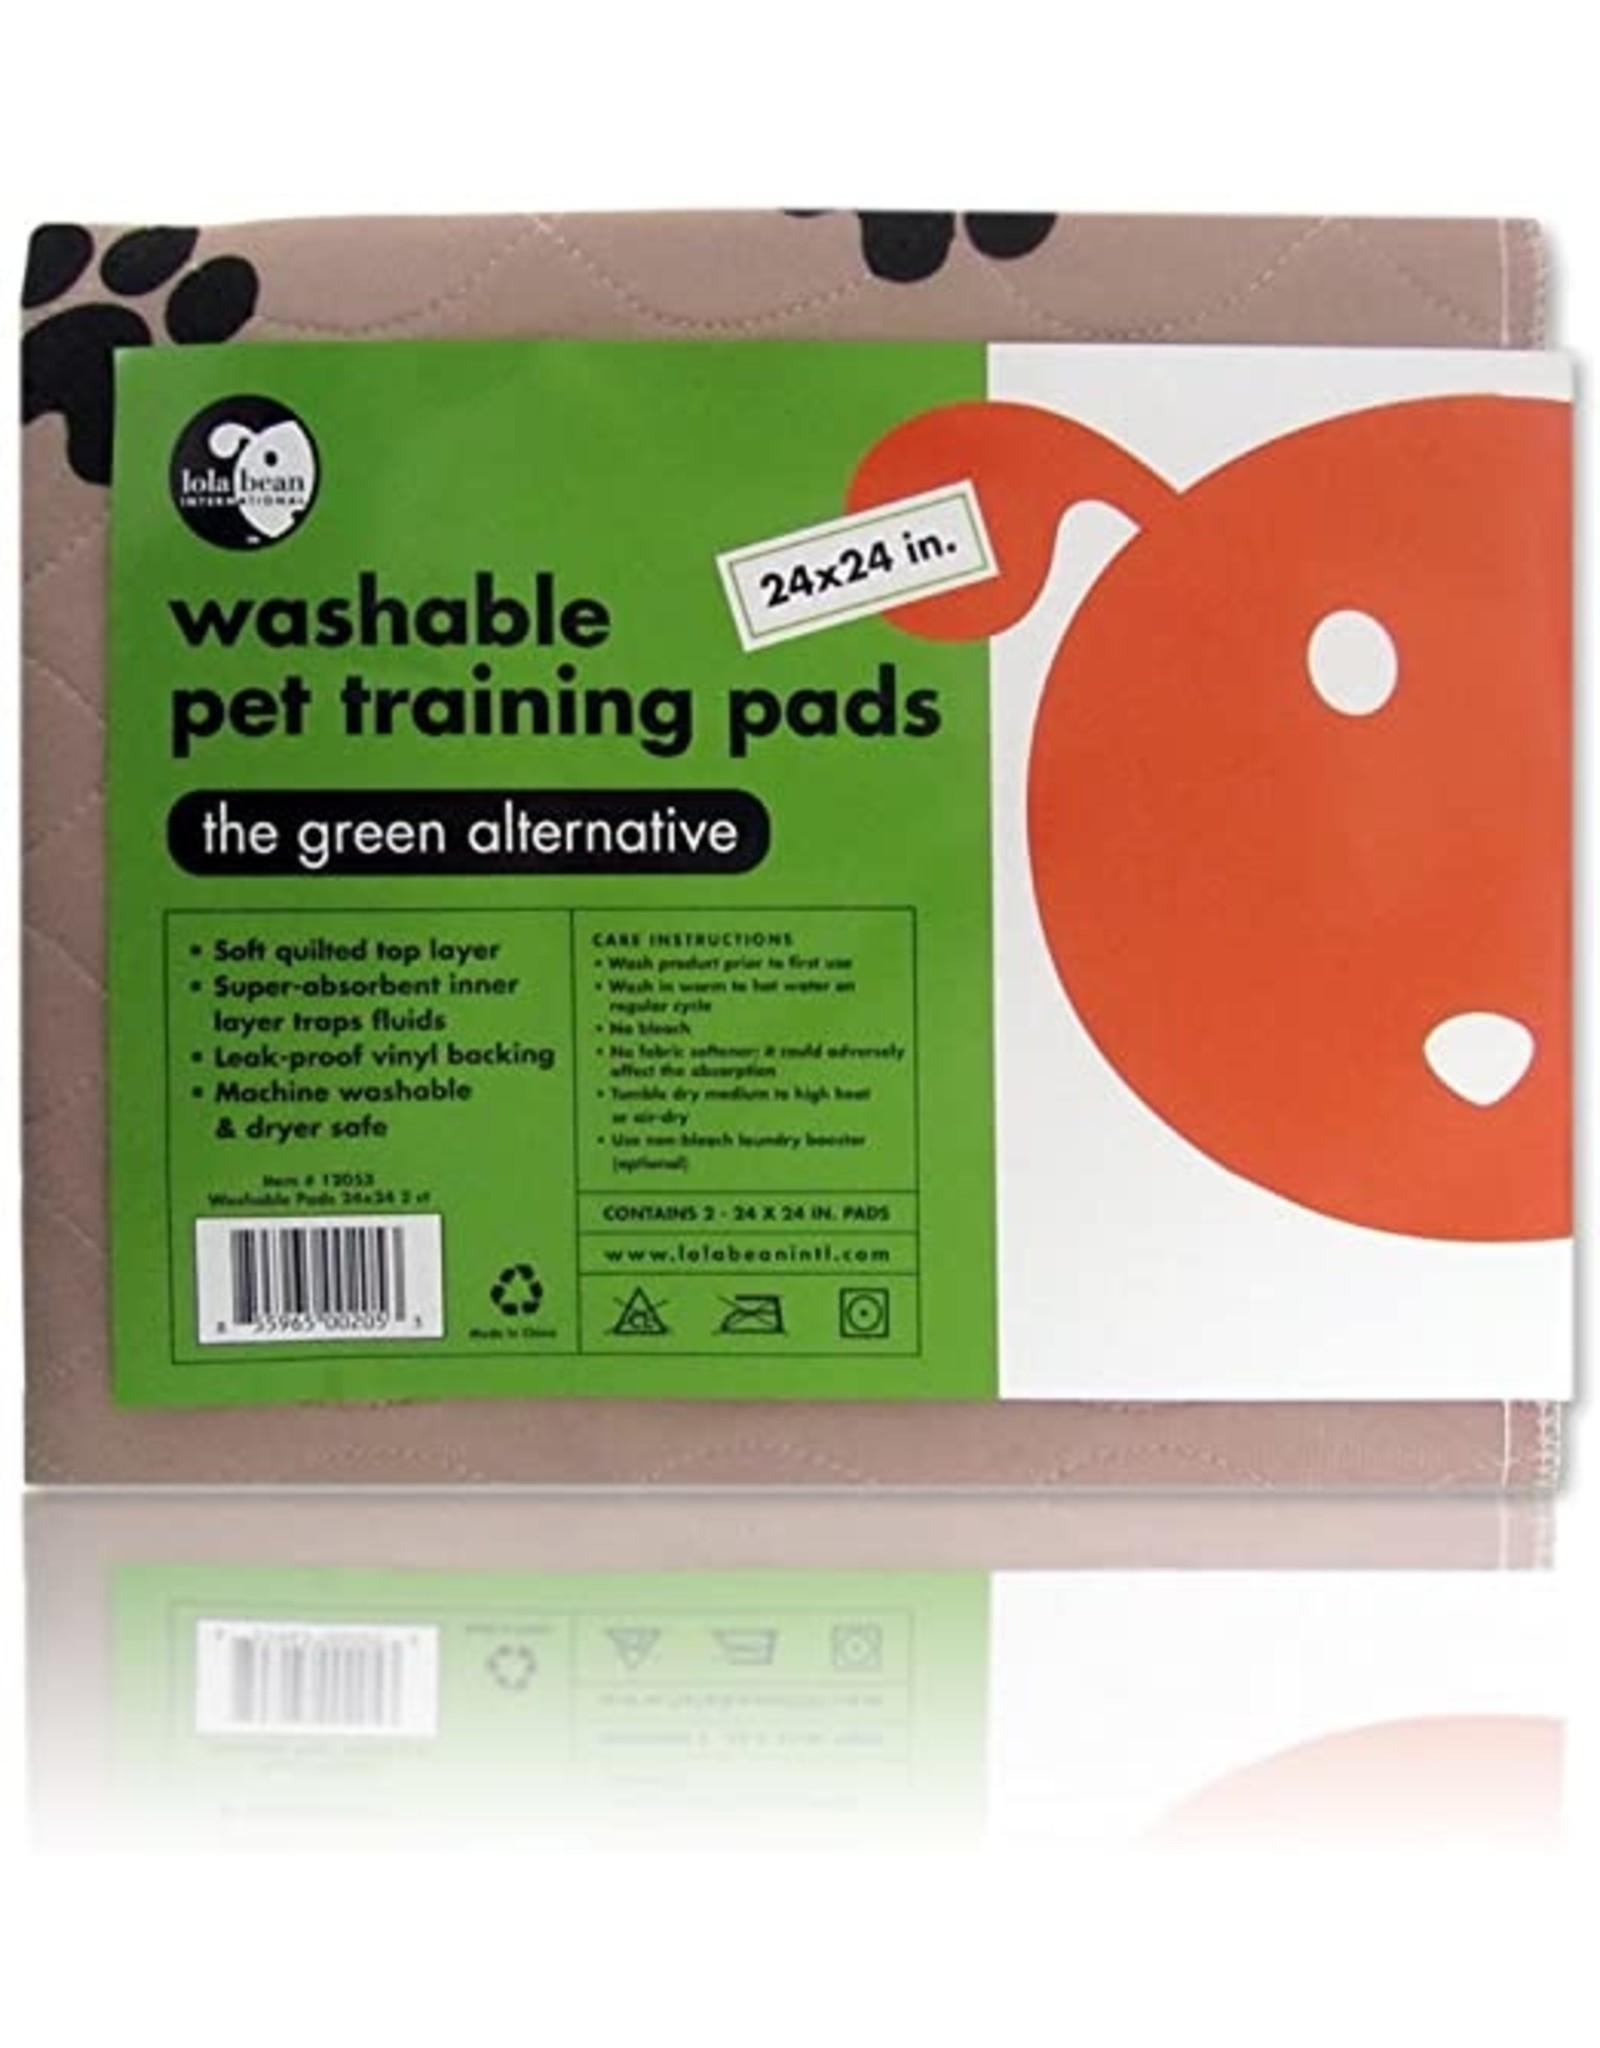 Lola Bean Washable Training Pad 24x24